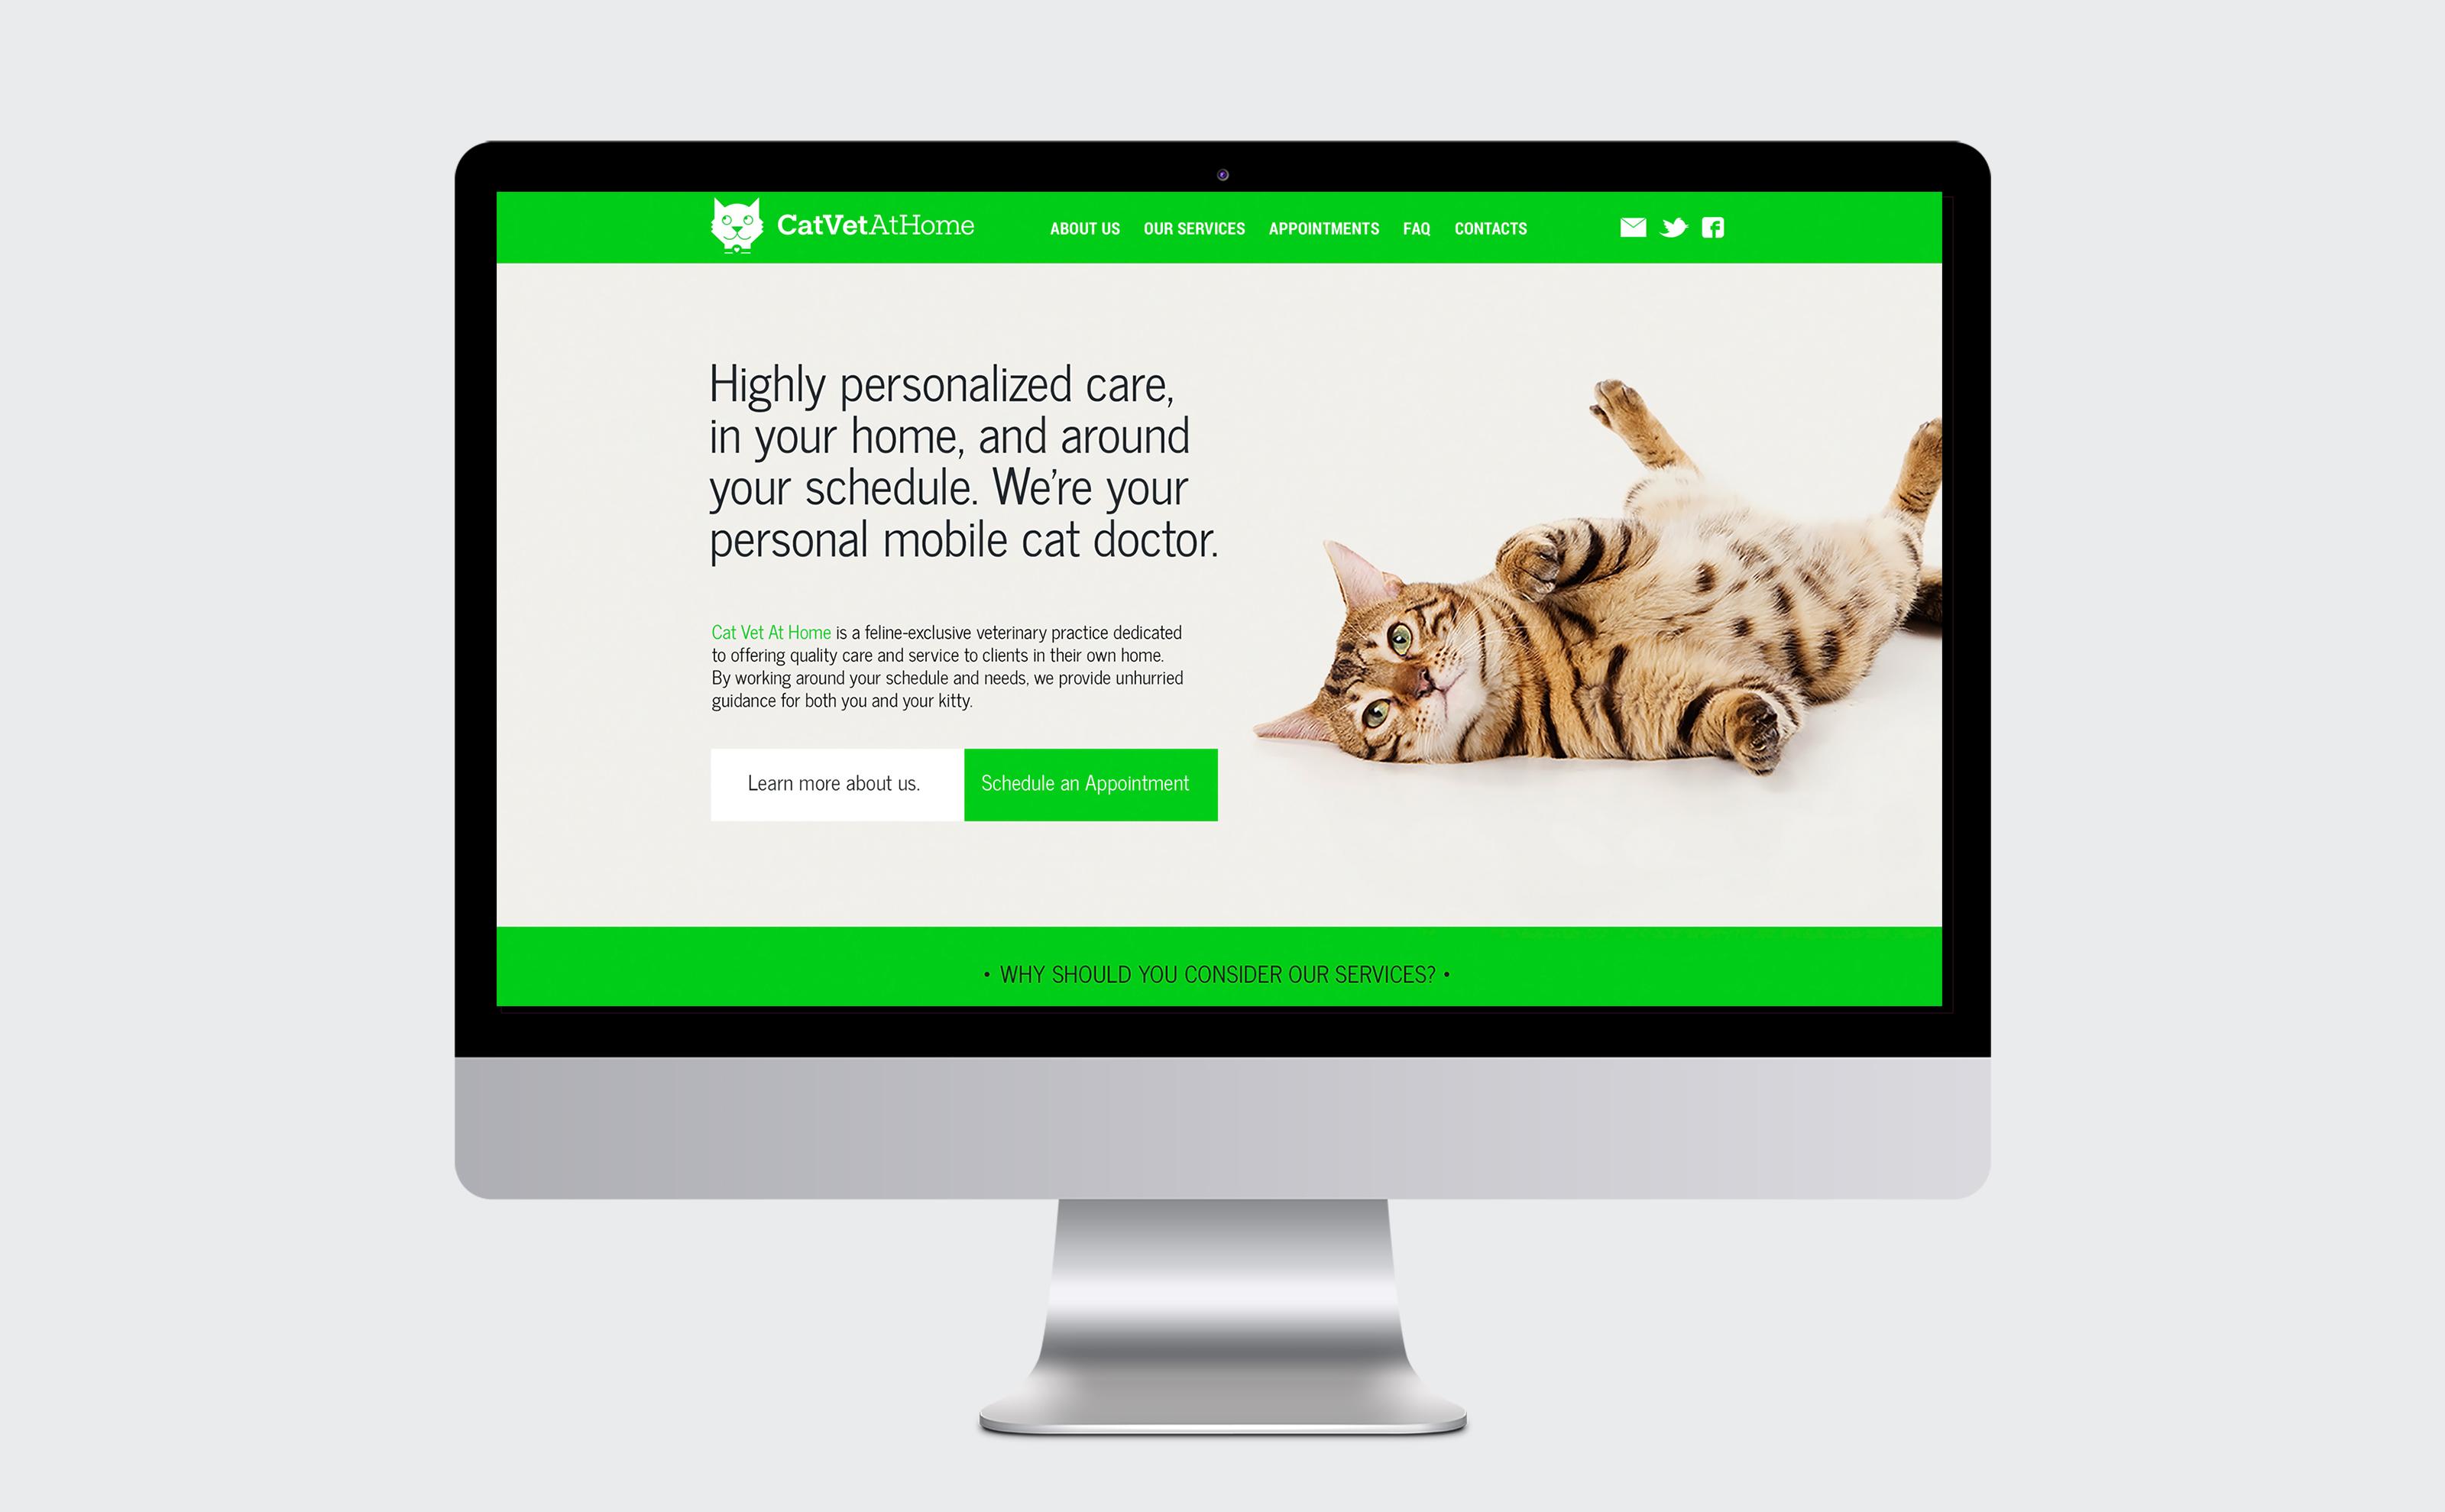 Cat Vet At Home website landing page